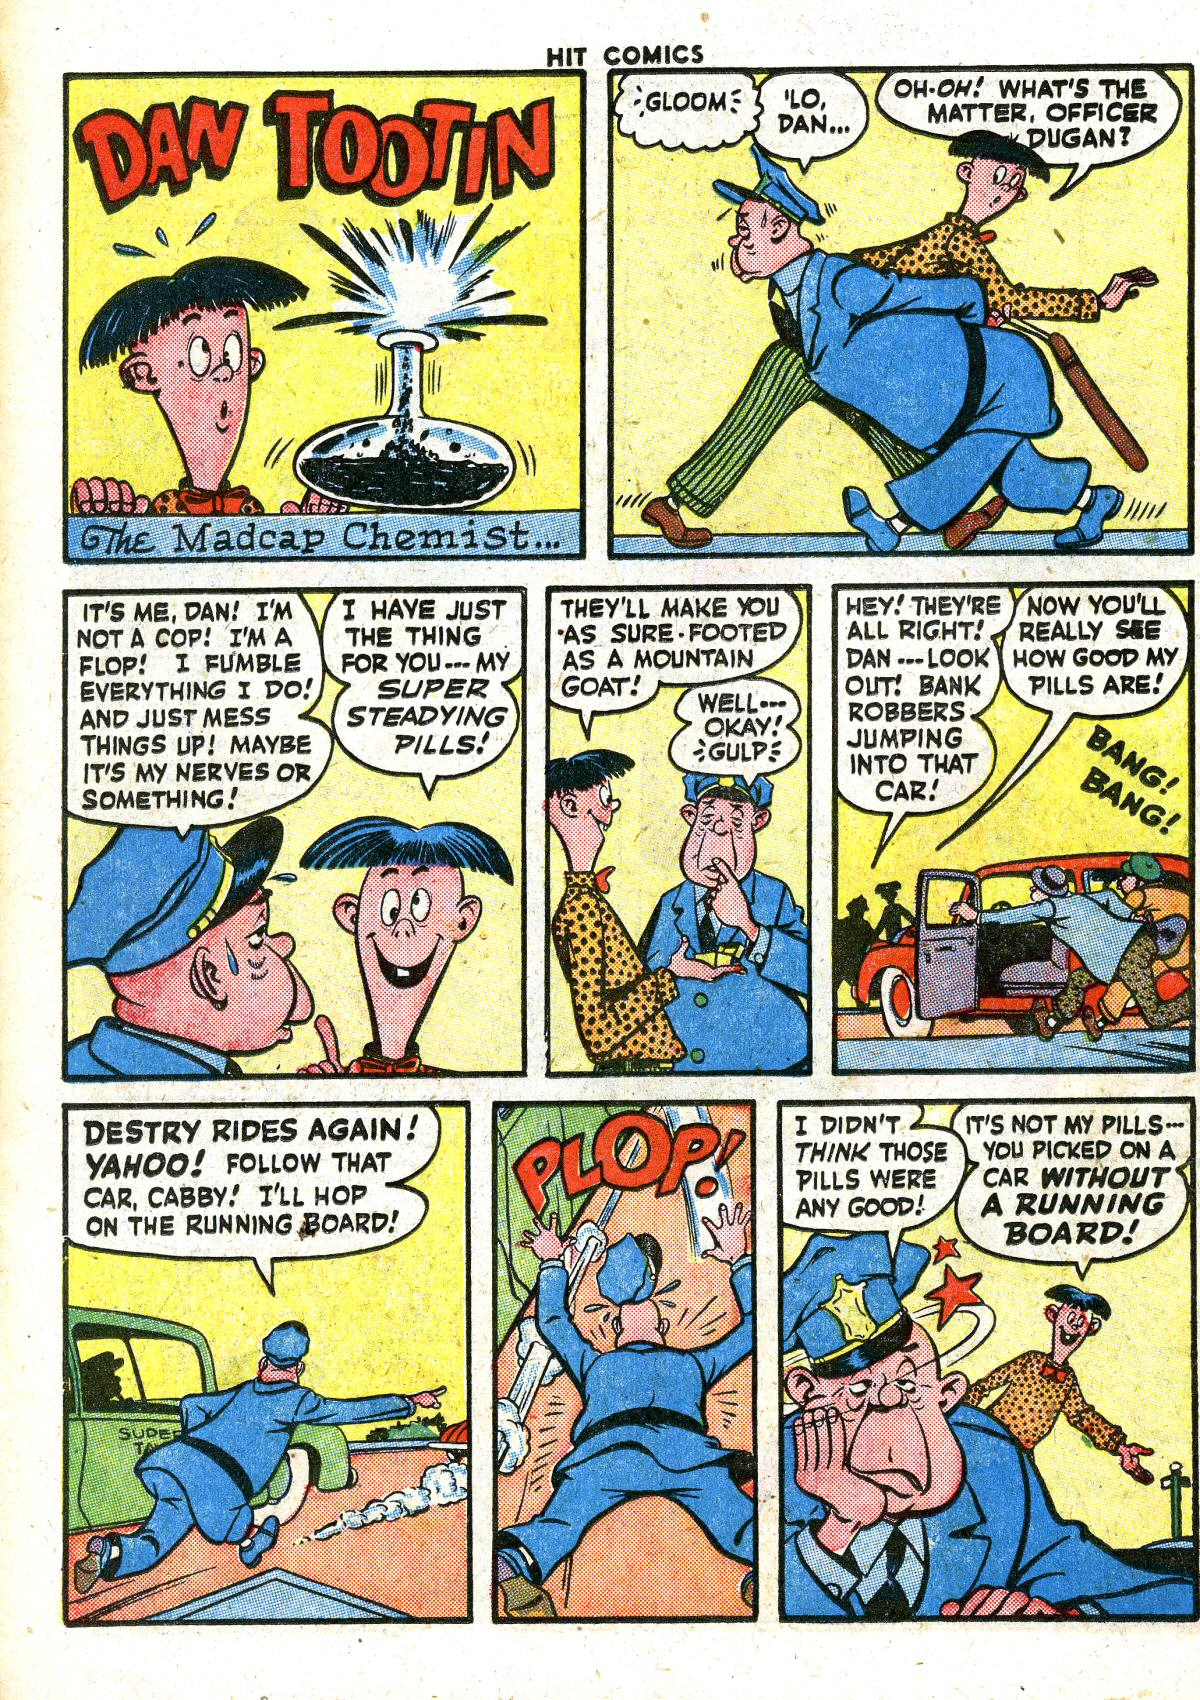 Read online Hit Comics comic -  Issue #41 - 38